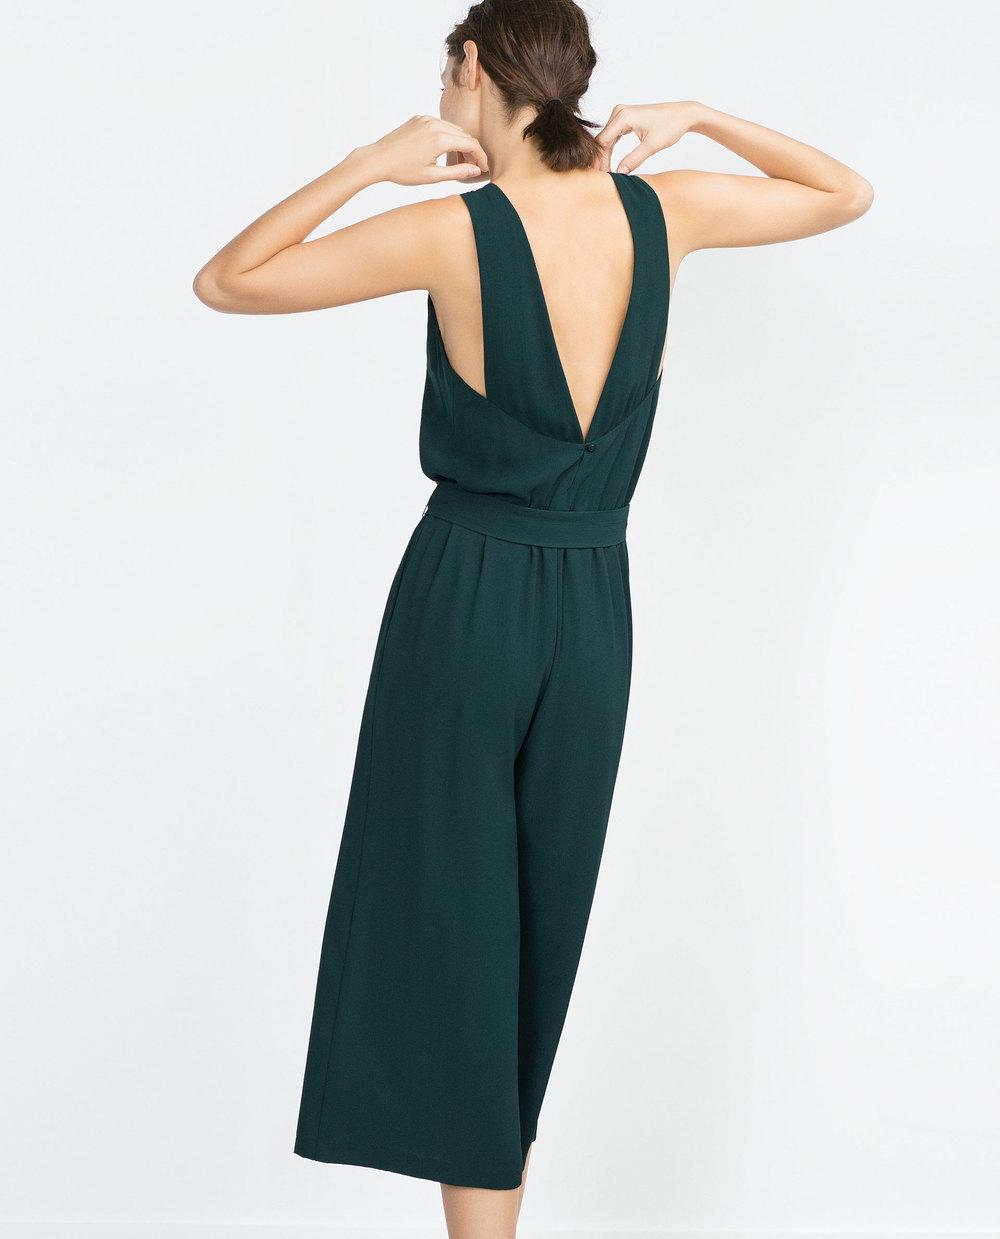 Fancy Cropped Jumpsuit. Available in dark green, dark red. Zara. $69.